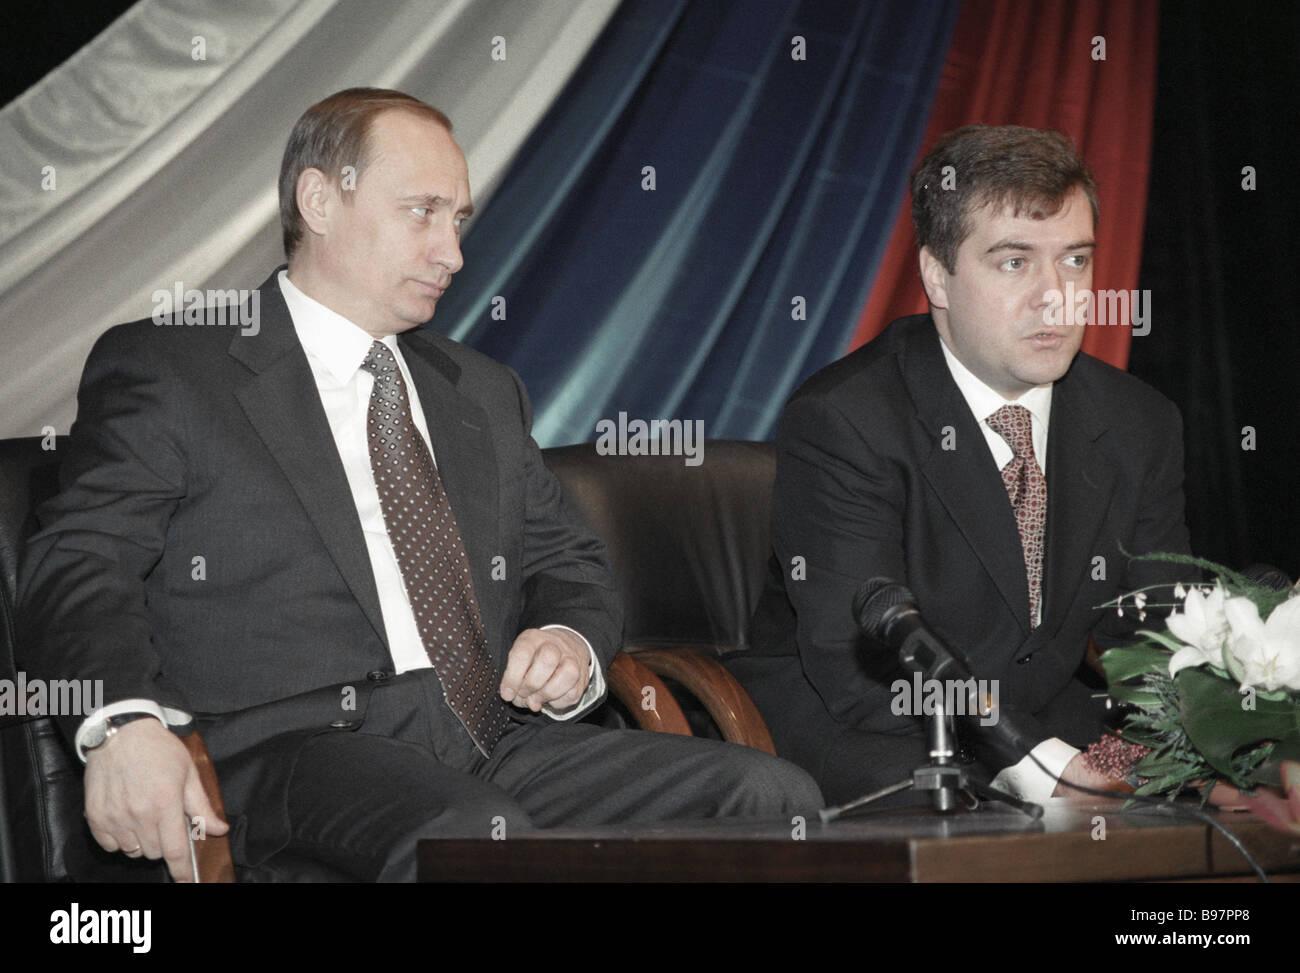 Vladimir Putin 2000 High Resolution Stock Photography And Images Alamy